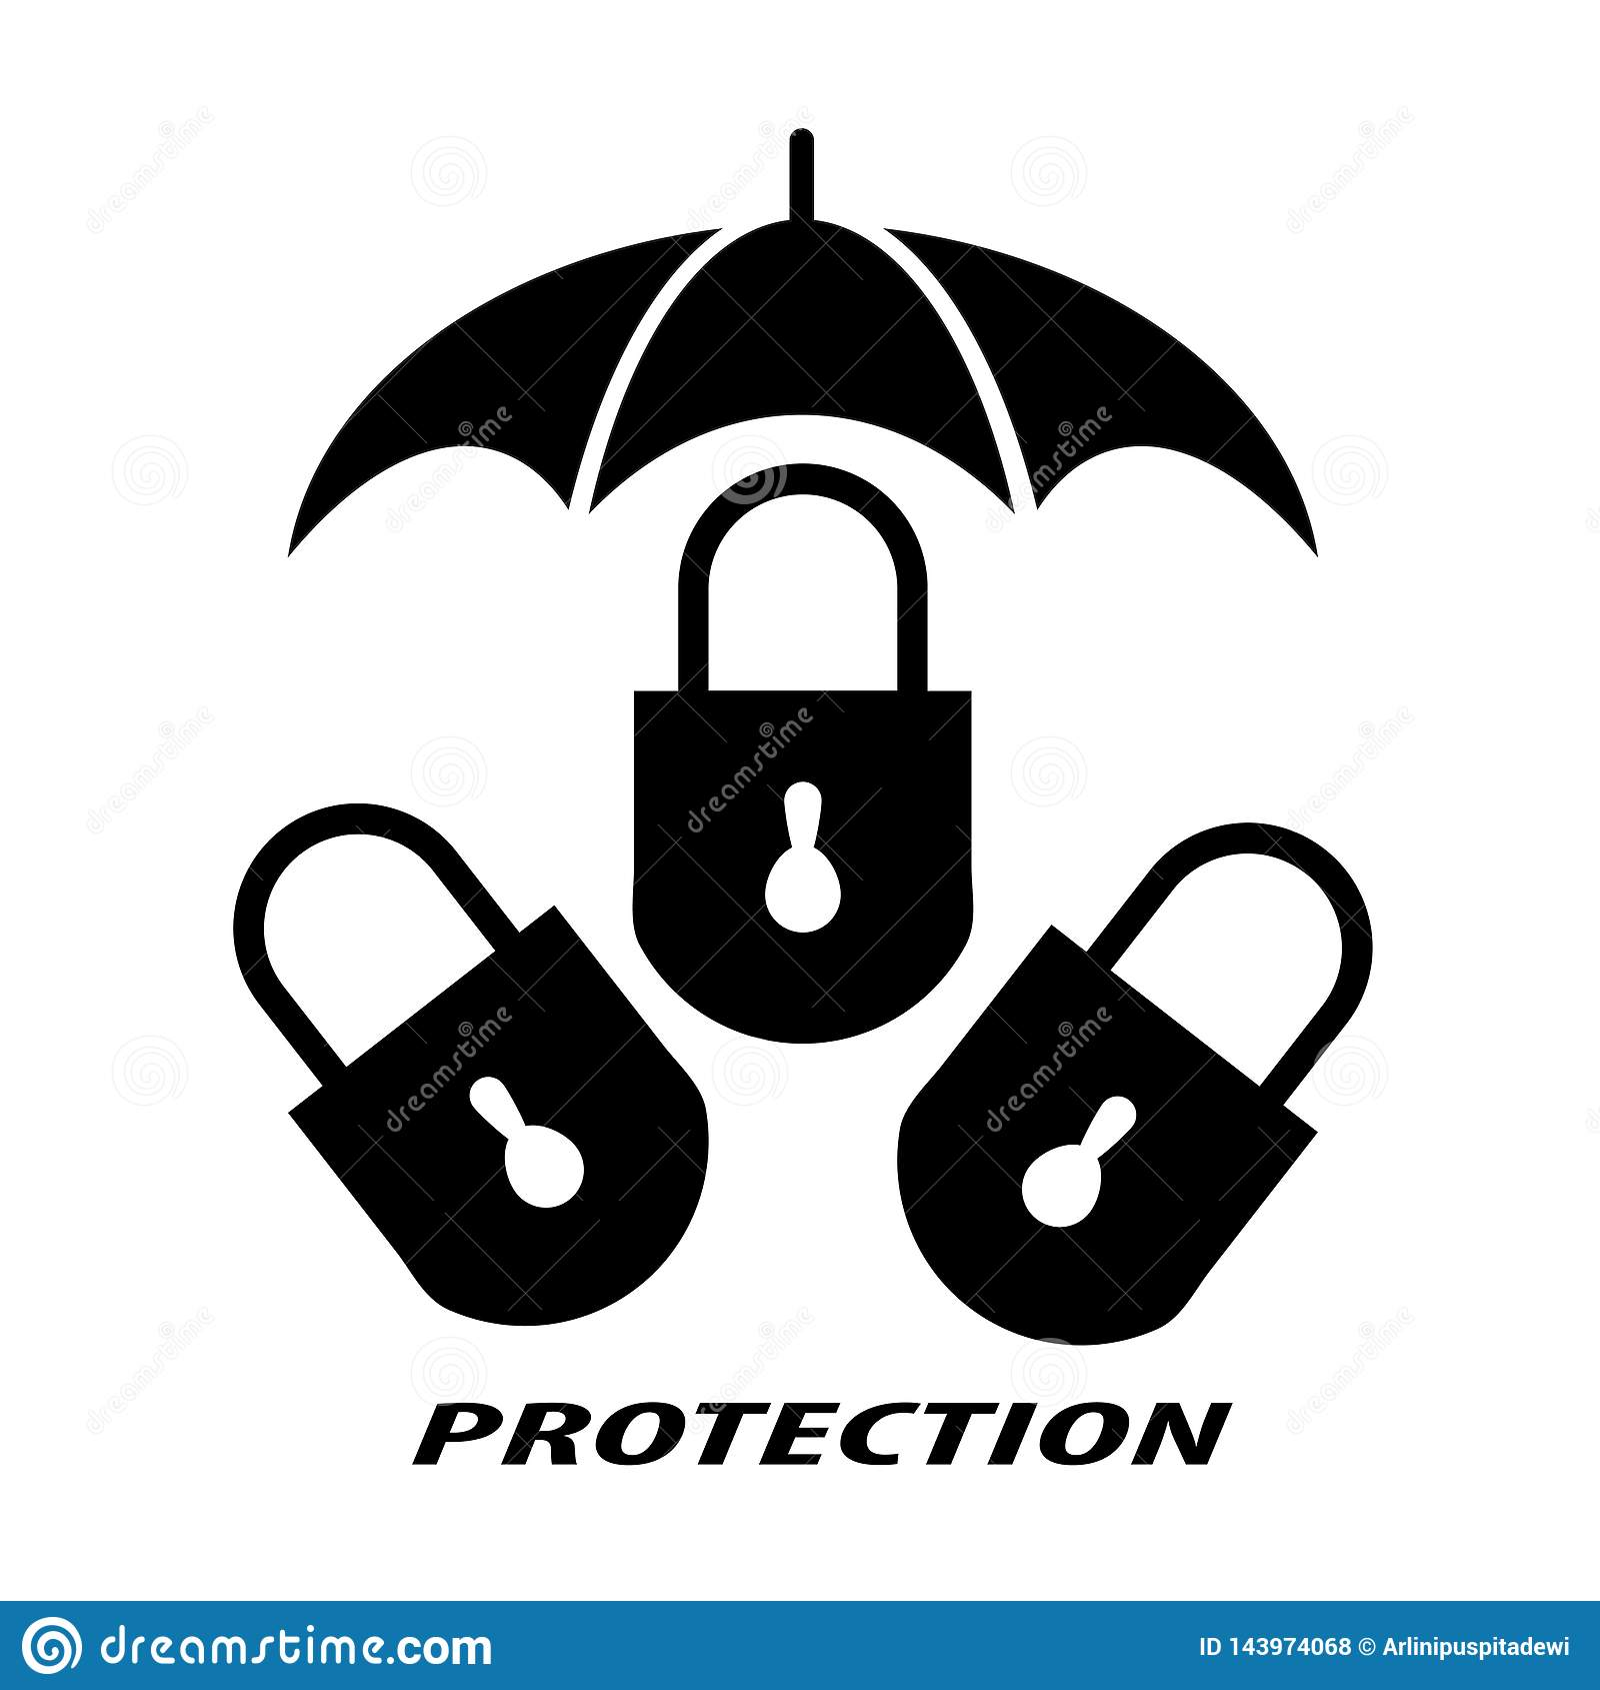 Padlock symbolizes protection